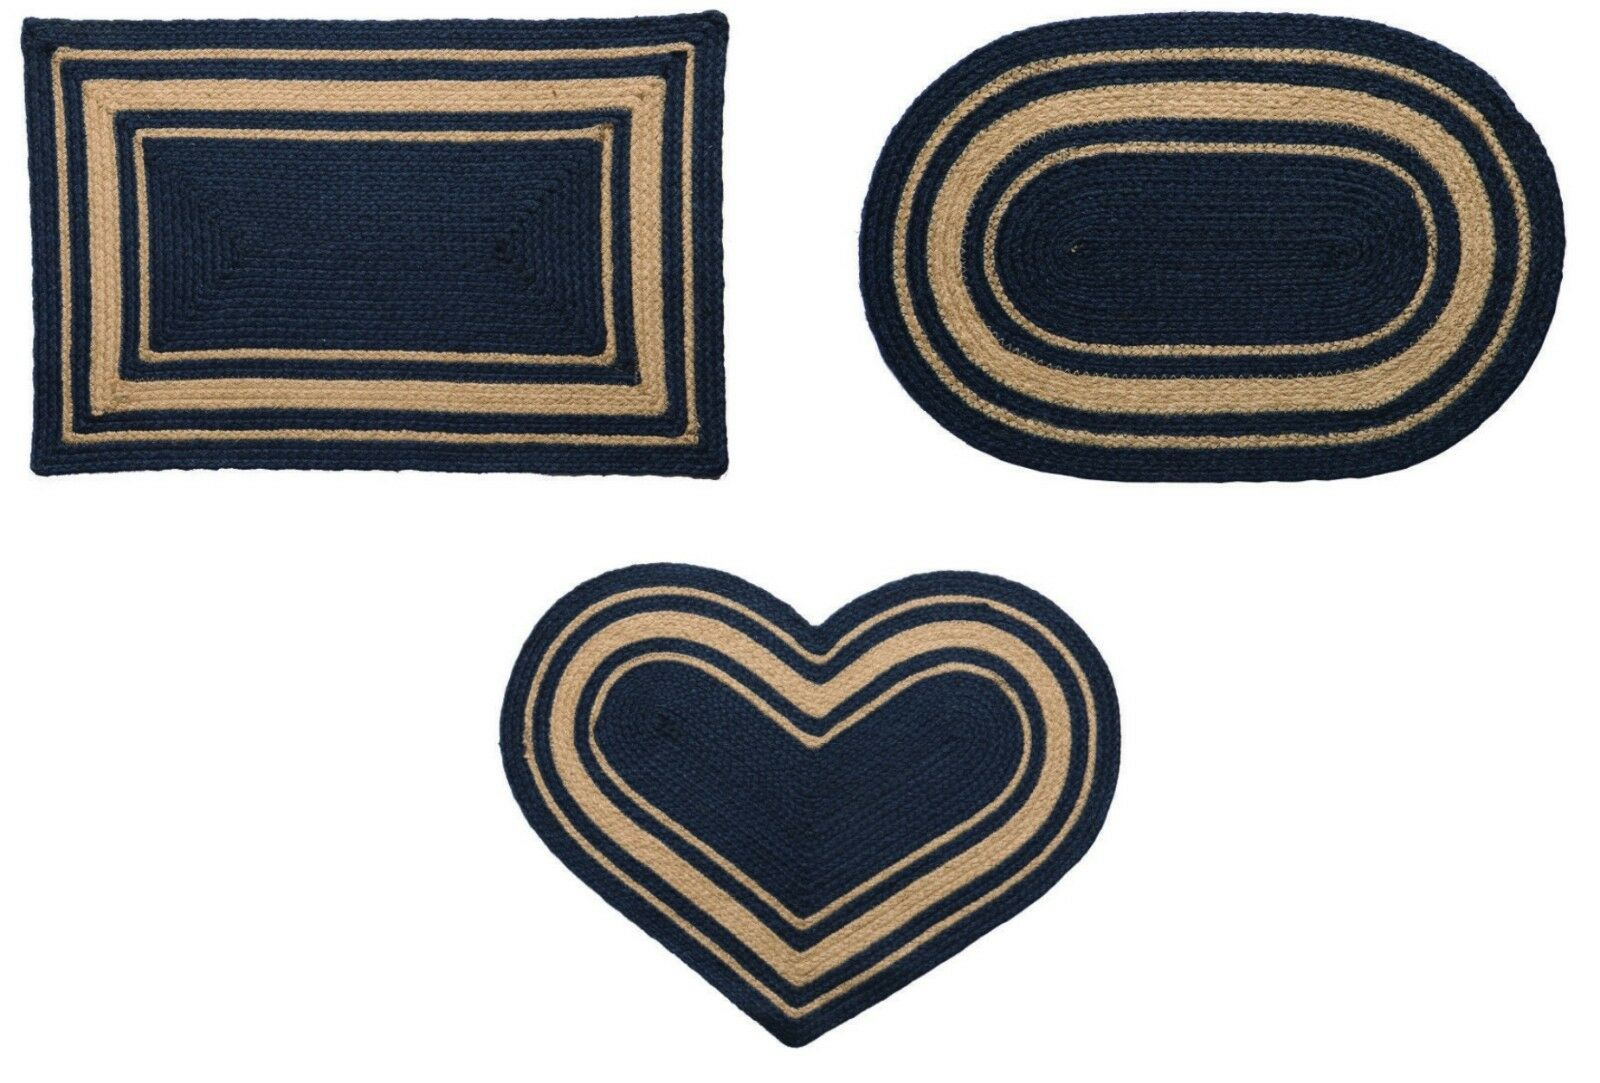 Heritage Blue Braided Area Rug Heart Rectangle Oval Jute Fab